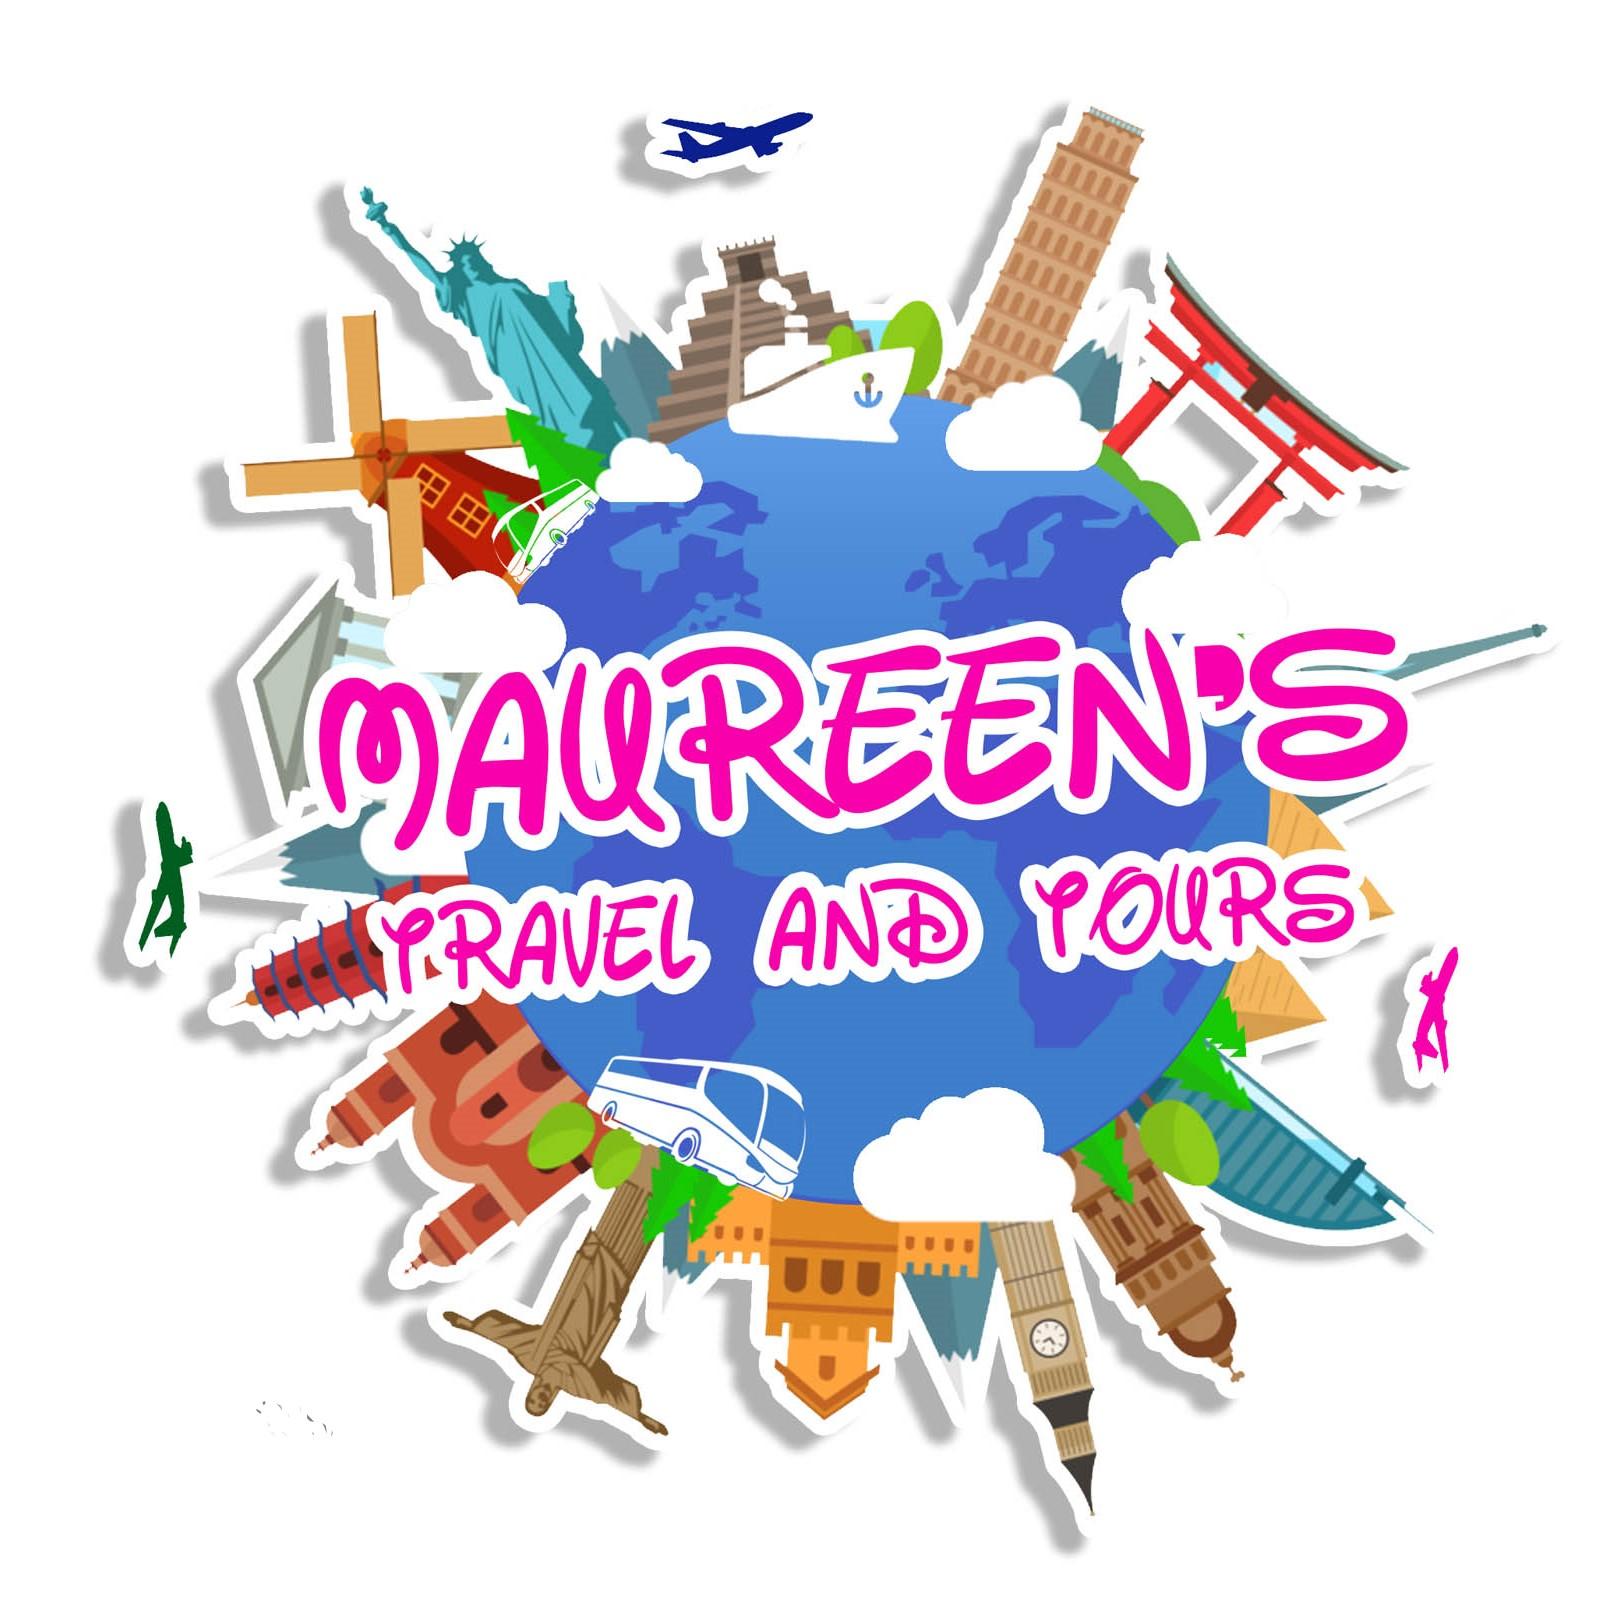 Maureen's Travel and Tours, Maureen Dela Cruz, Philippines